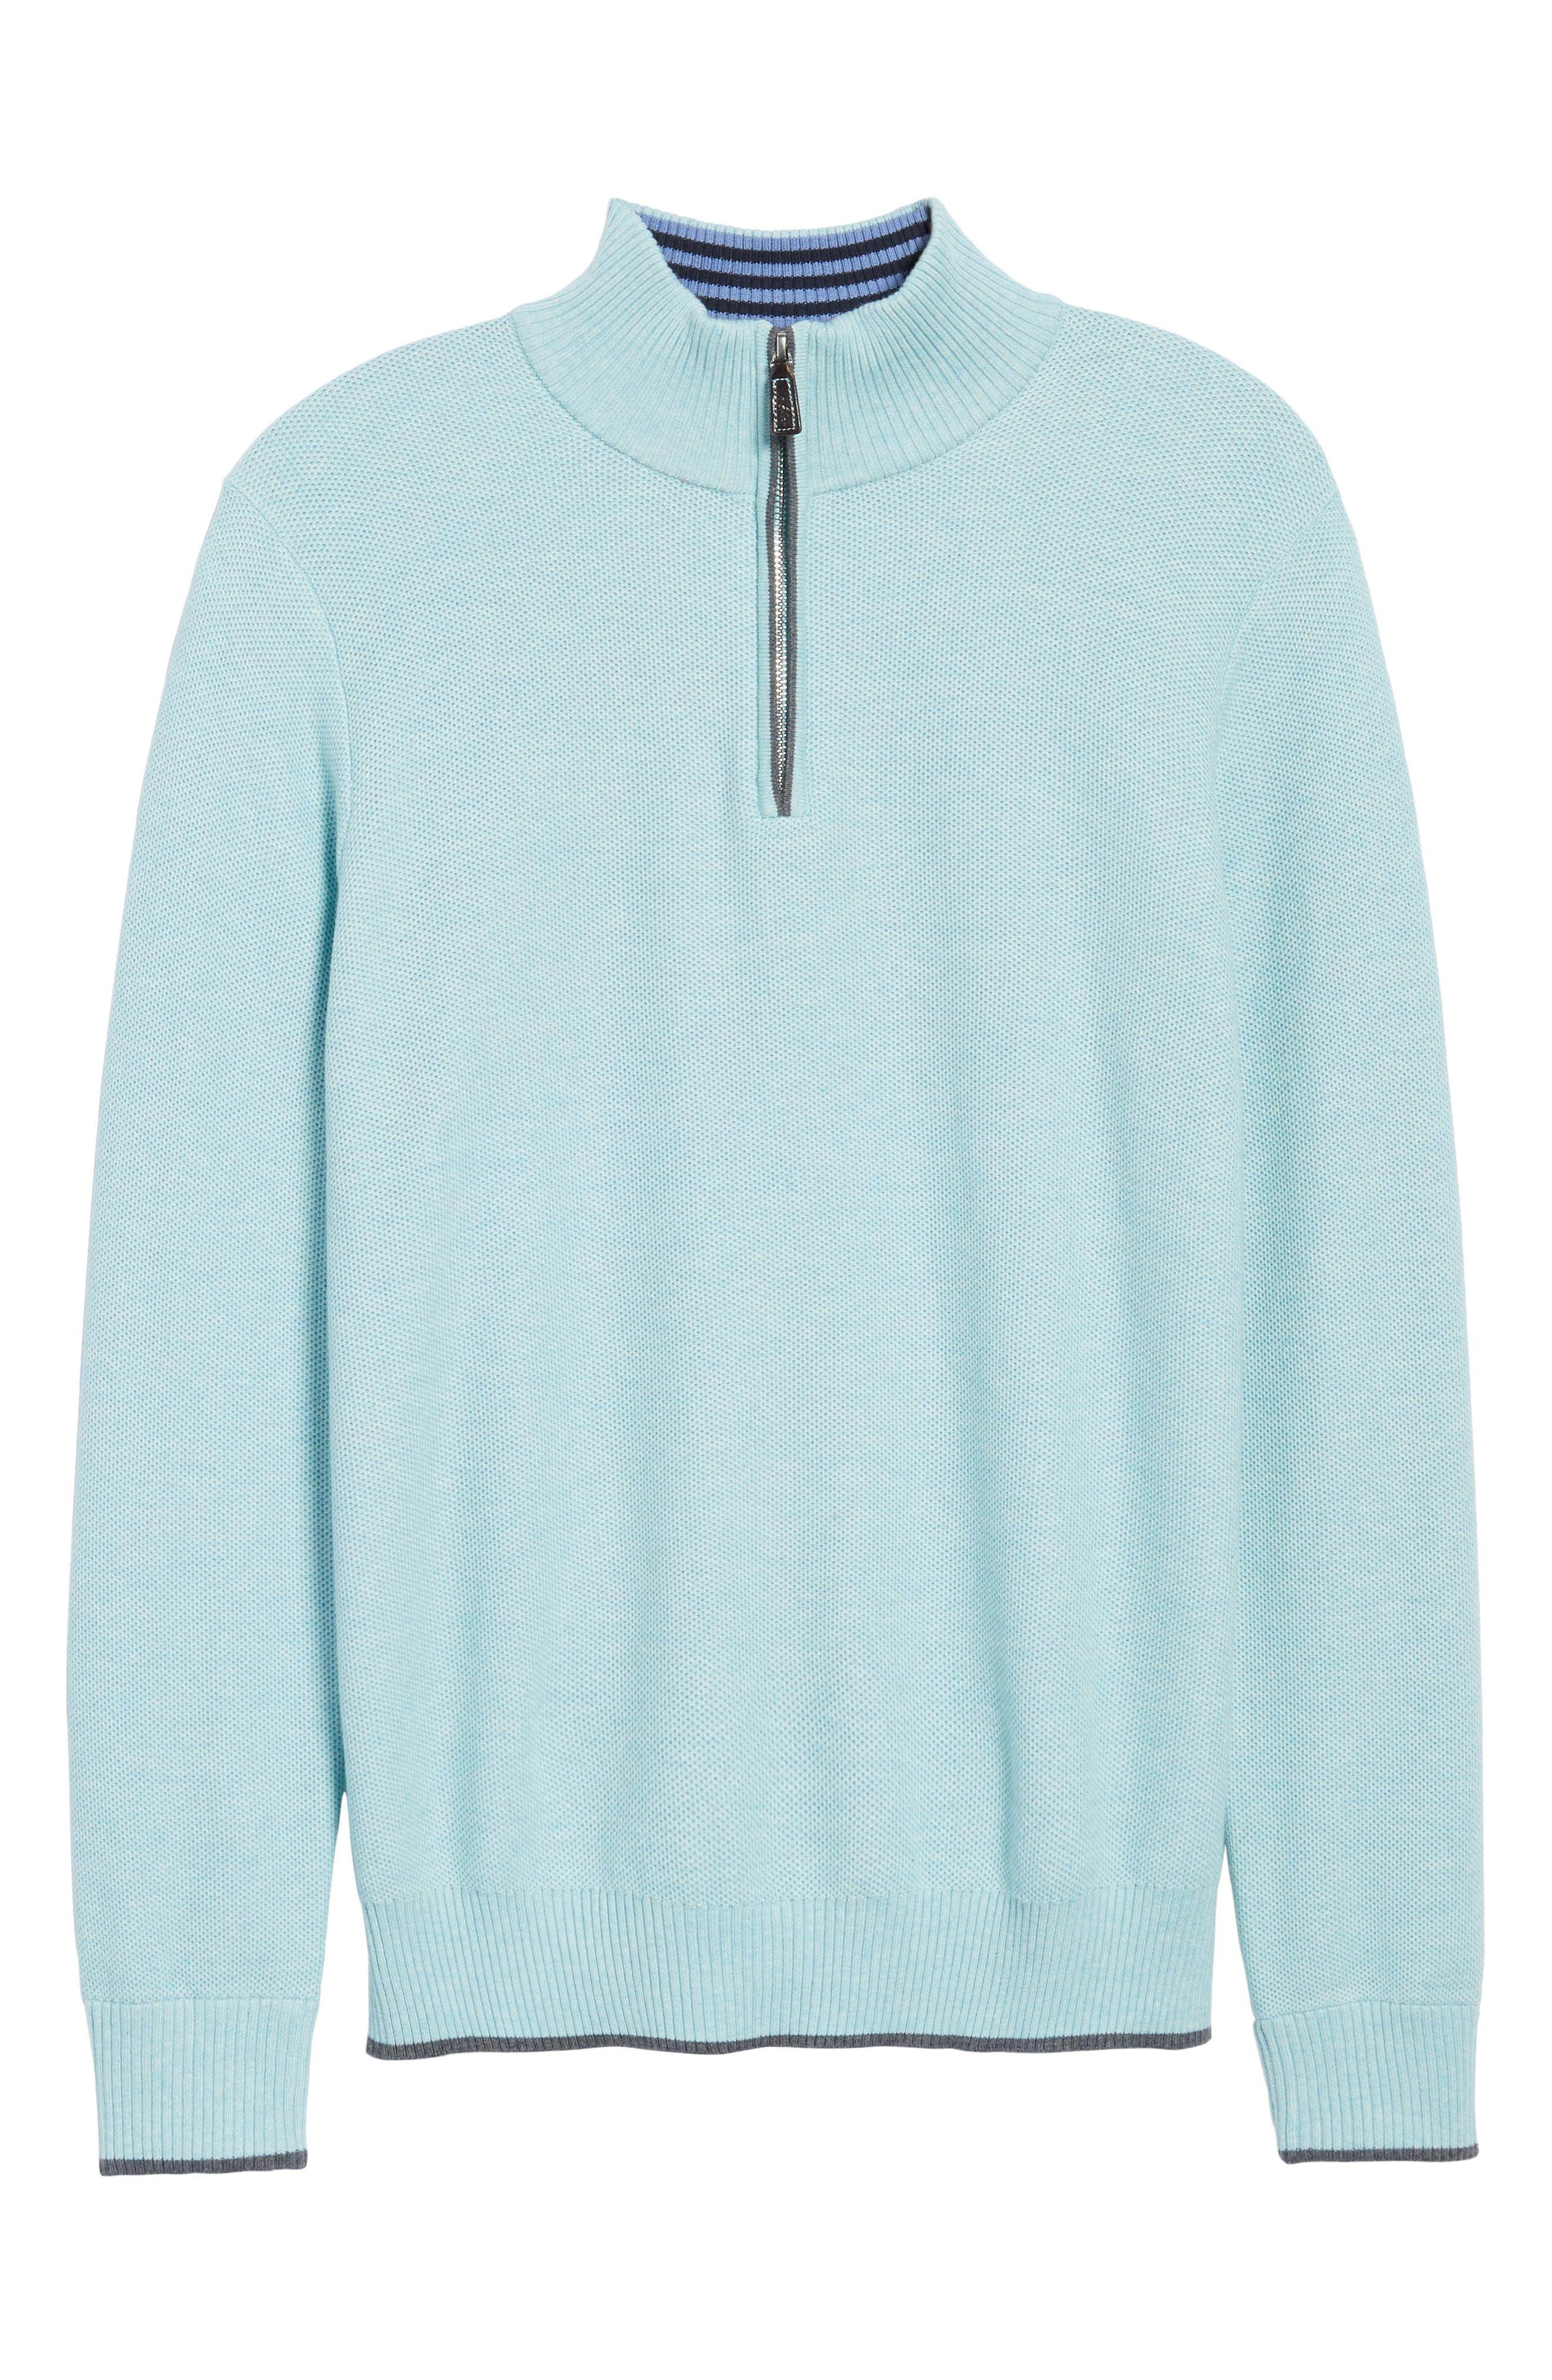 Starks Tipped Quarter Zip Sweater,                             Alternate thumbnail 6, color,                             Aqua